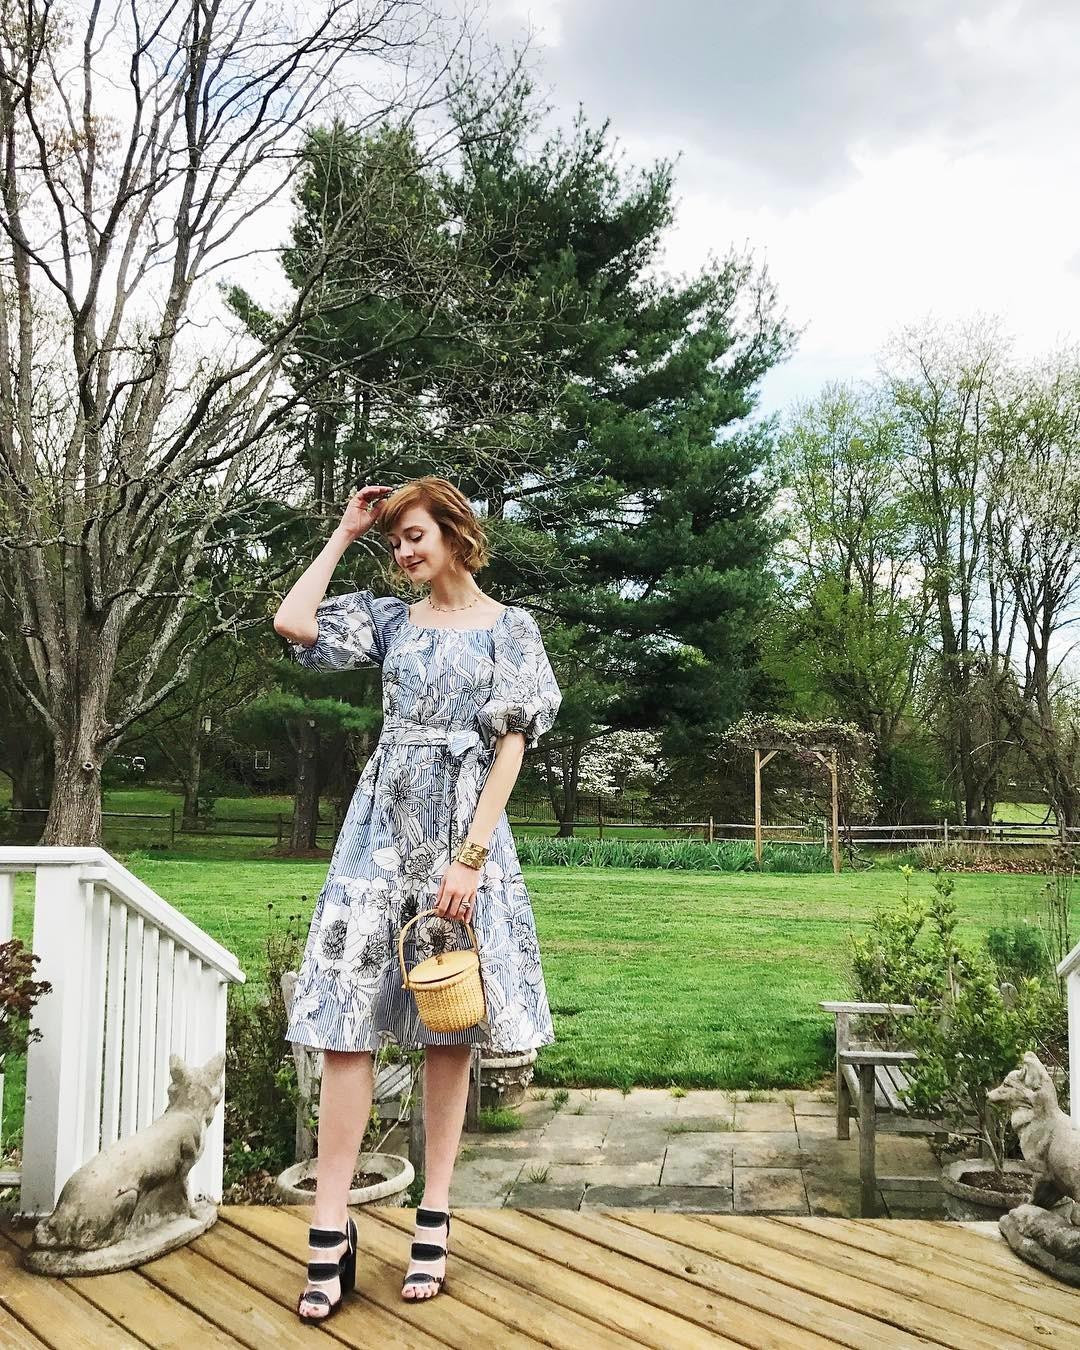 Zara pinstripe dress and Tabitha Simmons sandals